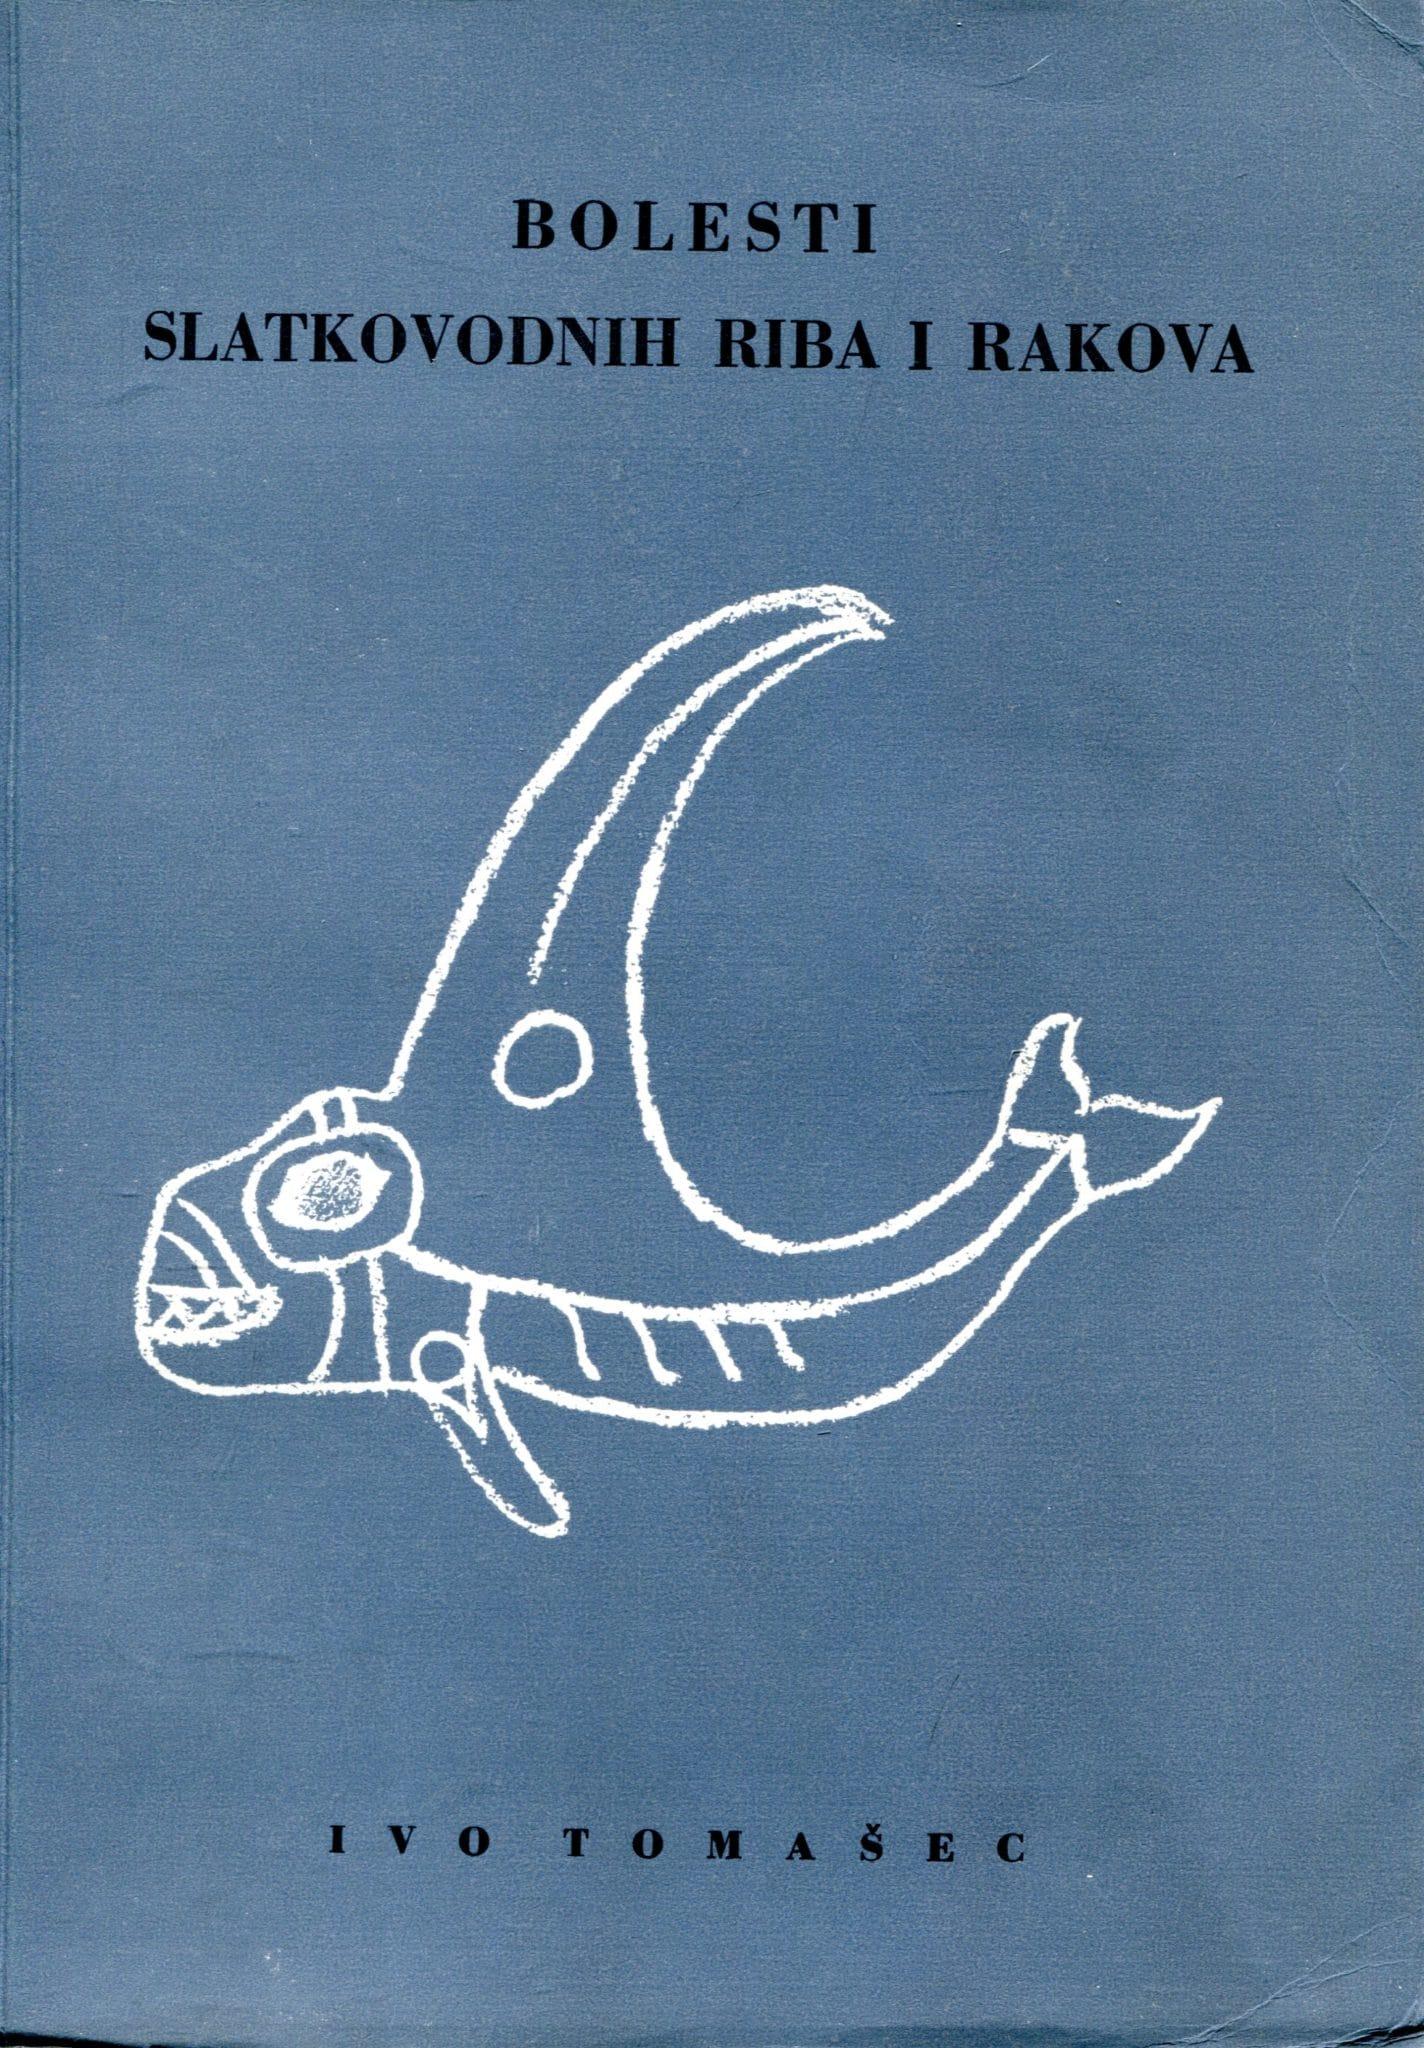 Bolesti slatkovodnih riba i rakova Tomašec Ivo